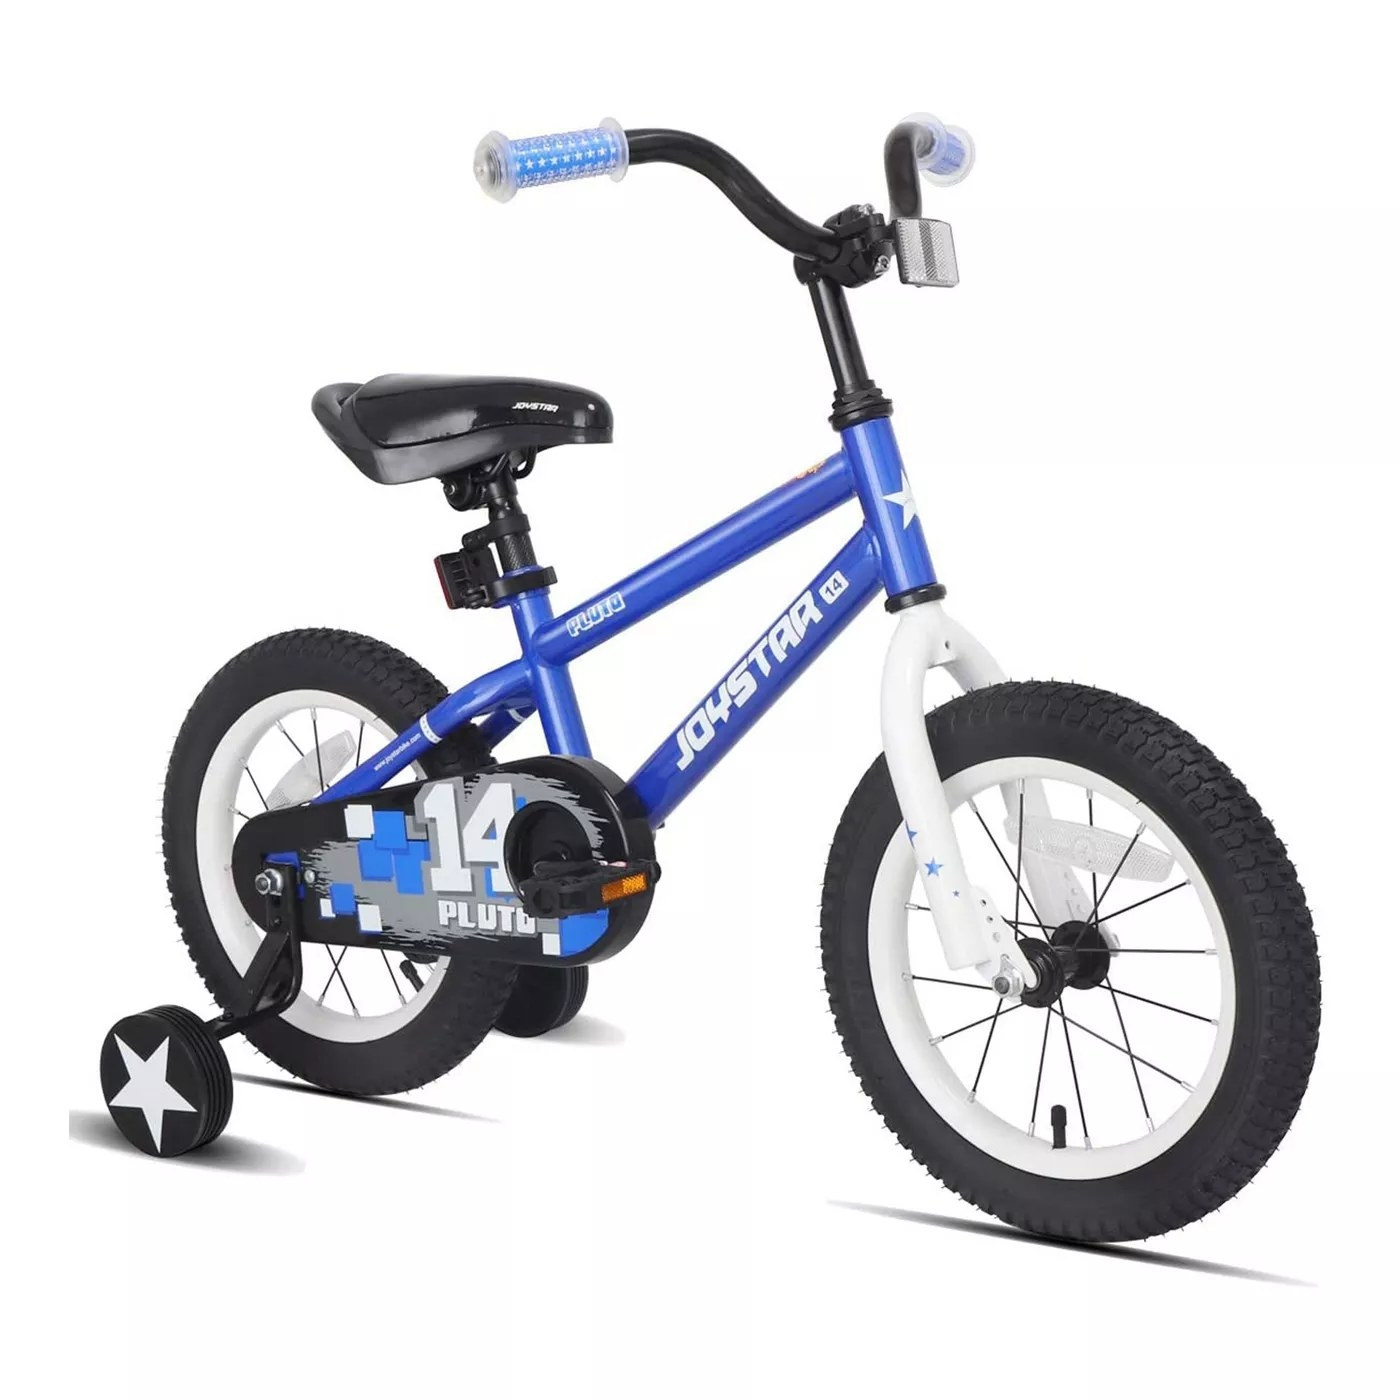 The blue Joystar bike